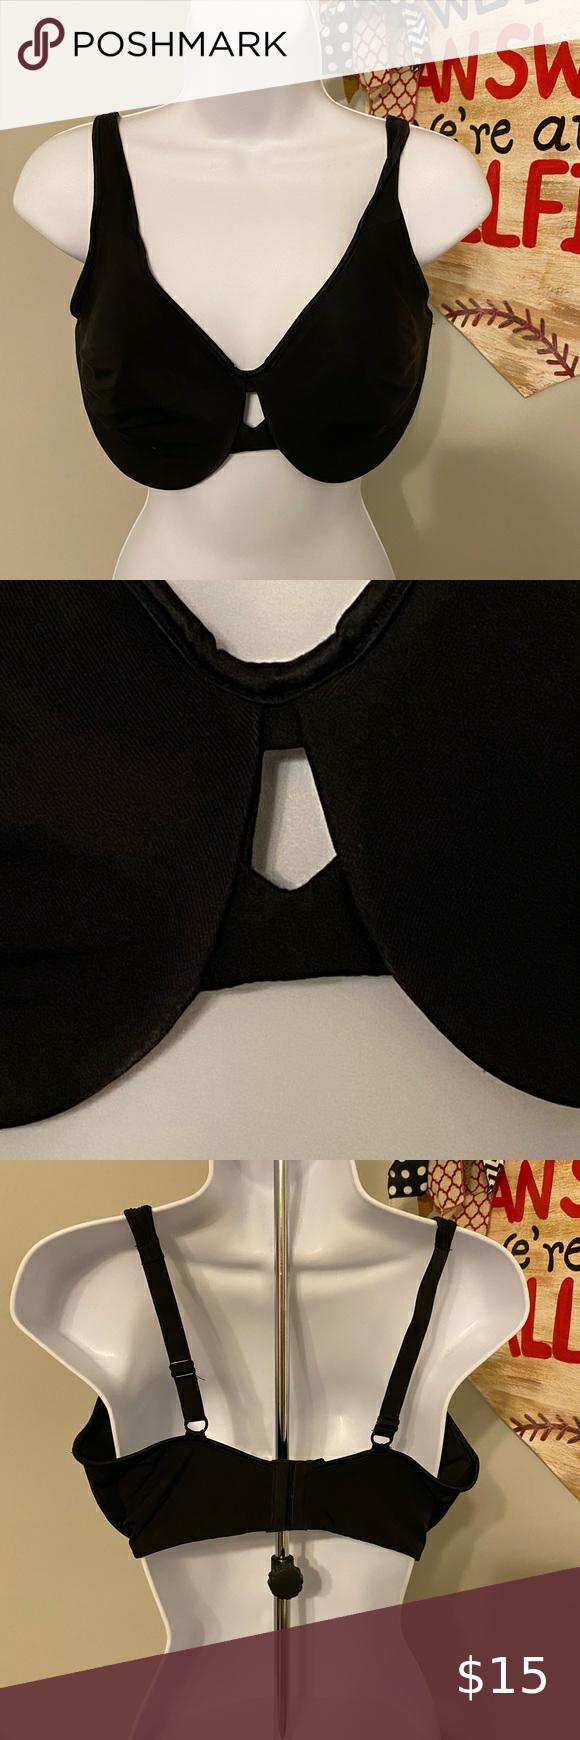 Lilyette 904 Plunge Into Comfort Minimizer Bra This is a Lilyette Plunge Into Comfort Minimizer Bra.  #0904.  Black.  Underwire.  Non-padded.  Size 38DDD.  It's in great condition. Lilyette Intimates & Sleepwear Bras